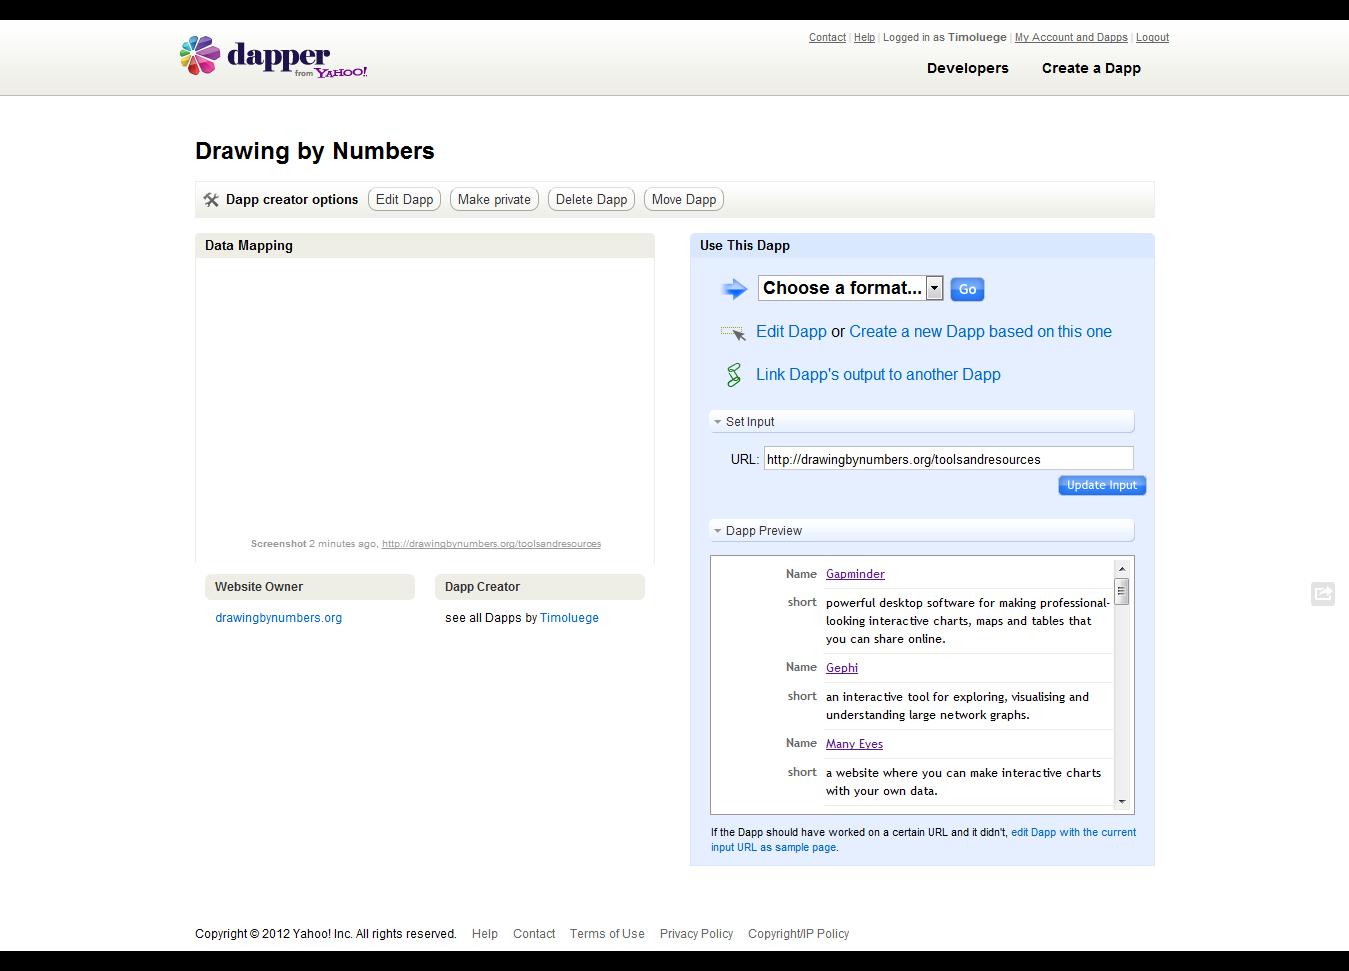 Dapper - Step by Step Part 4